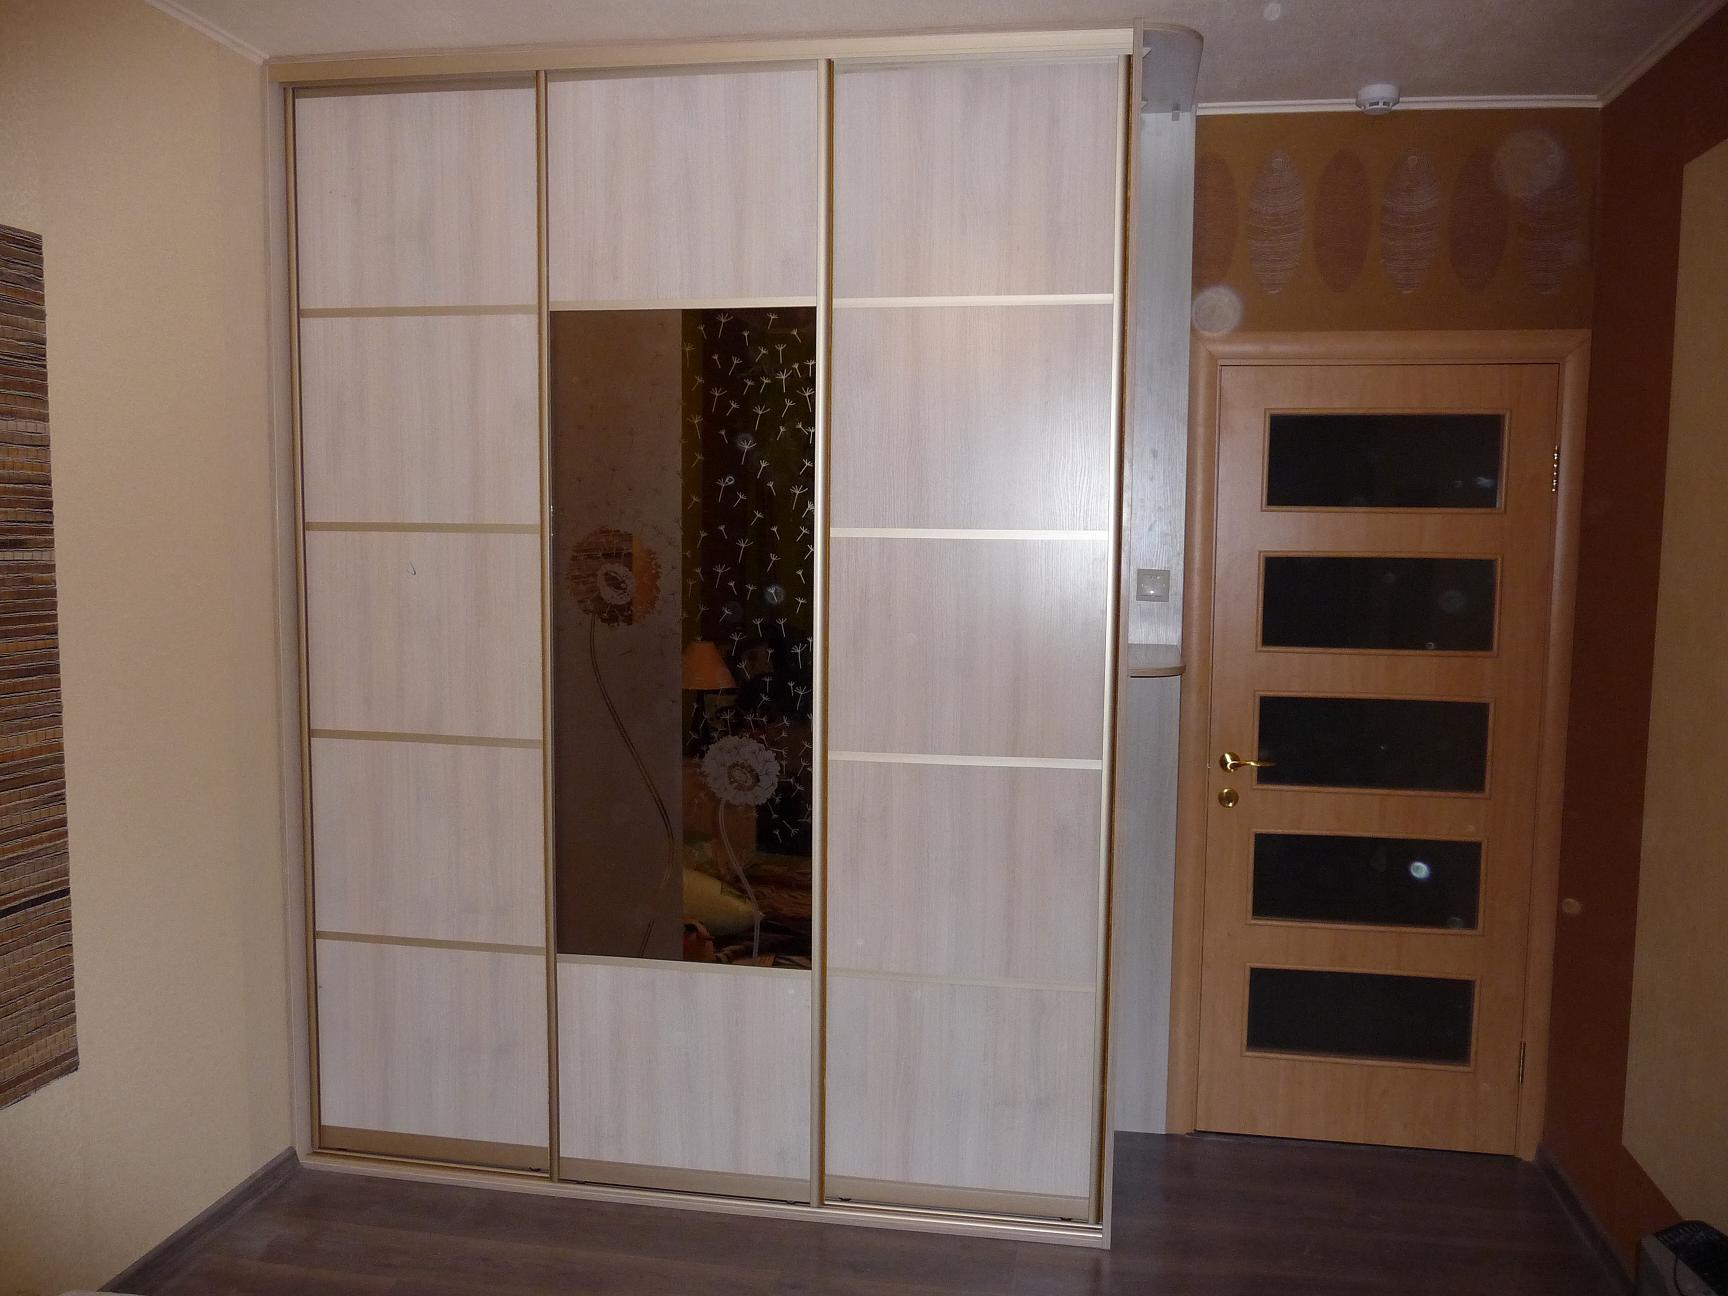 интерьер спальни со шкафом купе